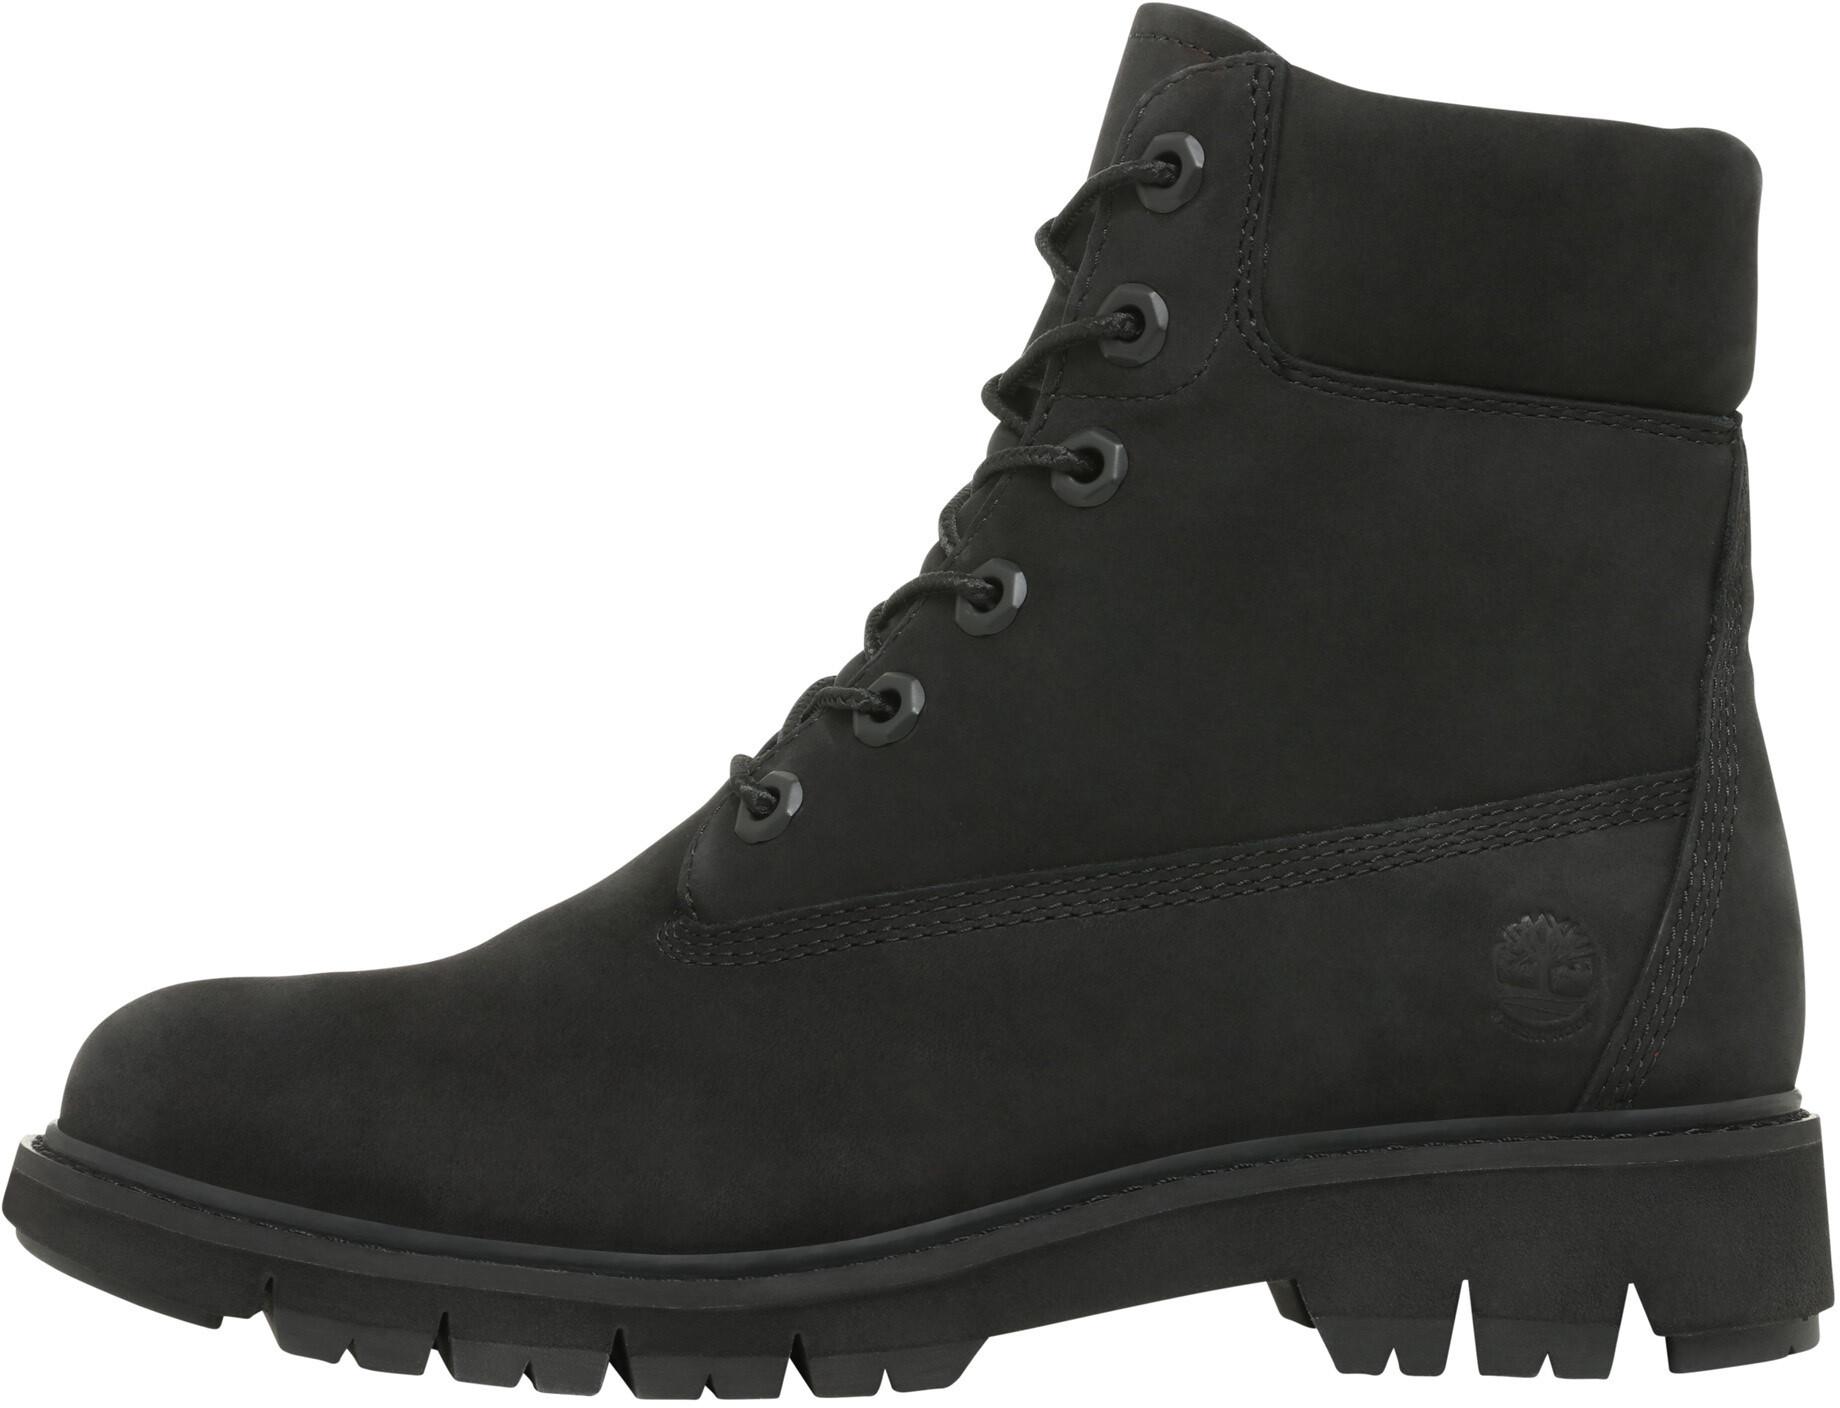 Timberland Lucia Way Wp Boots 6 Damen Black Nubuck Campz Ch